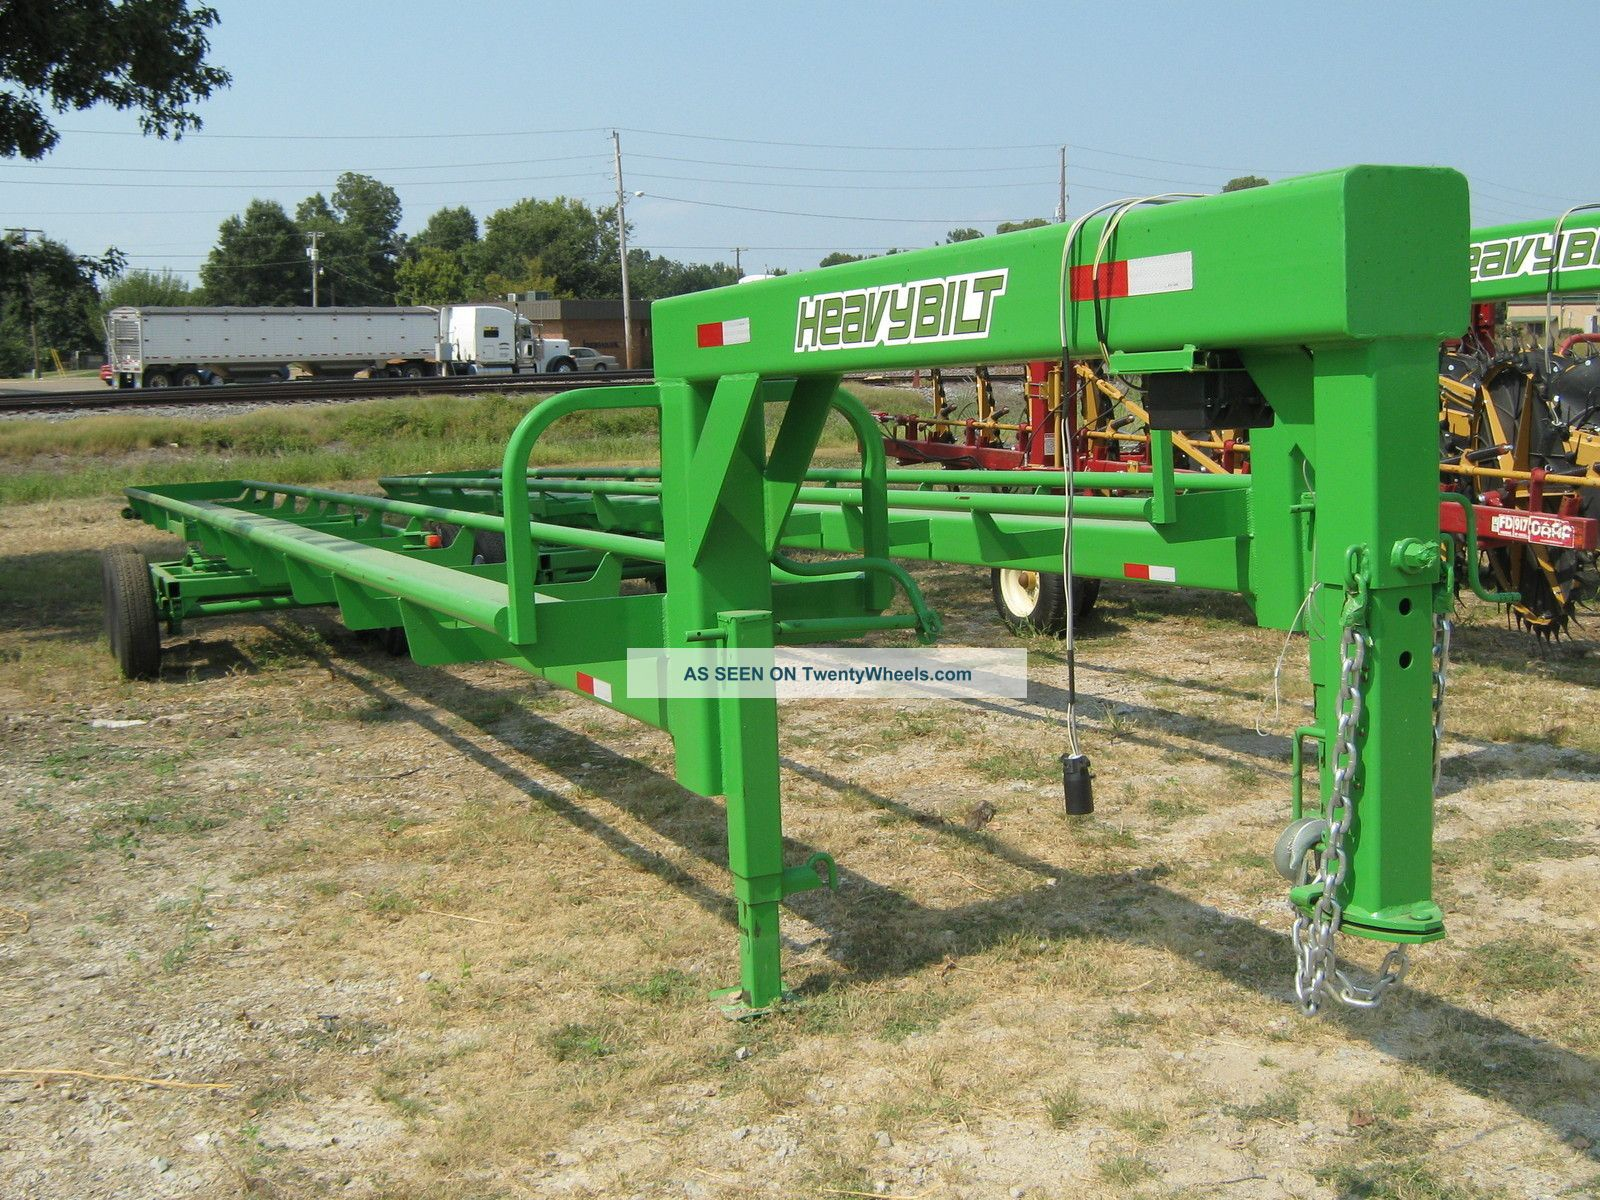 13768 35  heavybuilt hay trailer tandem axle side dump farm tractor deere holland